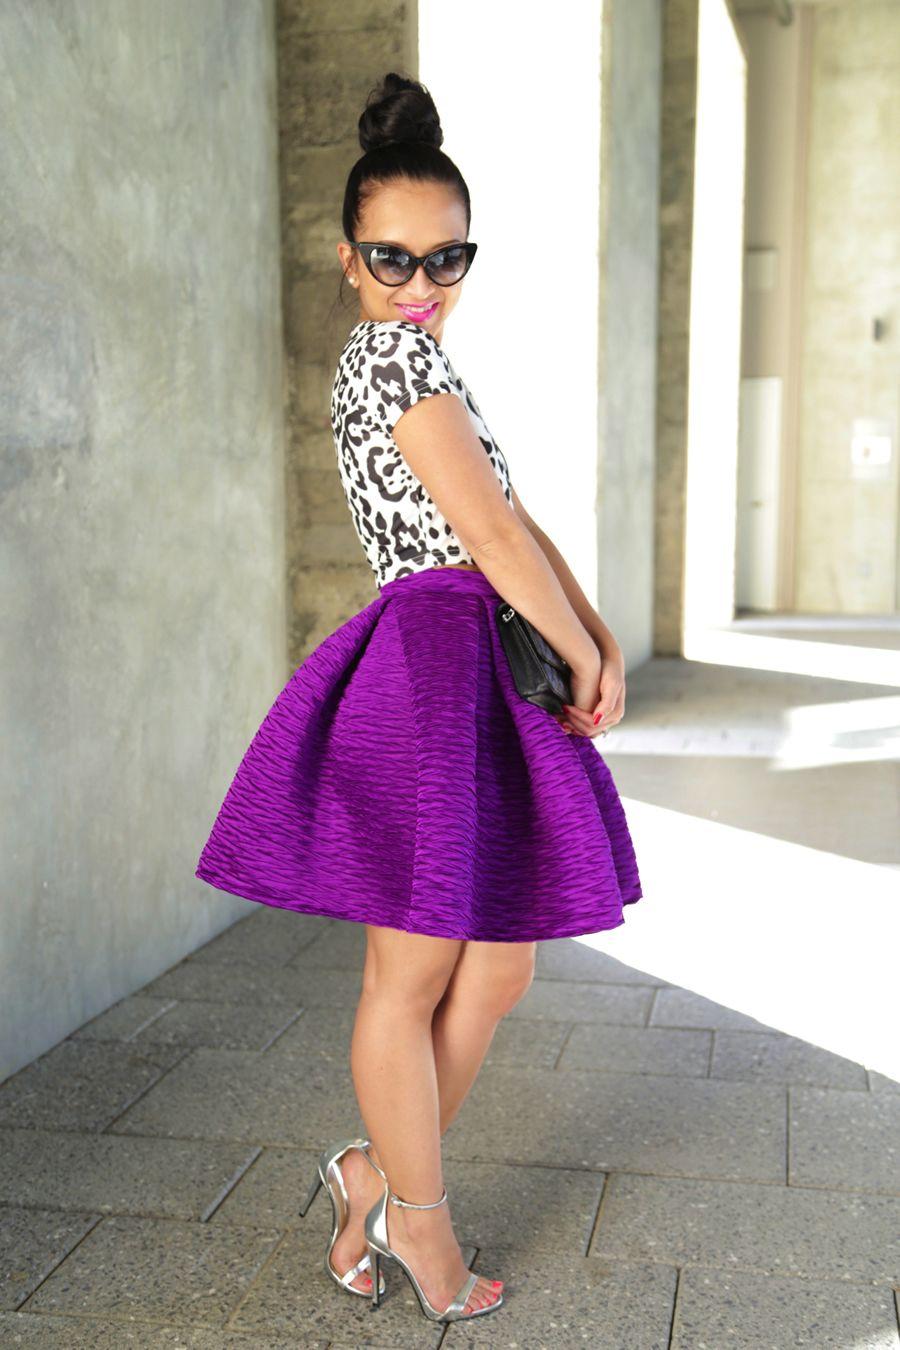 ktrstyle.com - Petite Style Fashion Blogger / Petite Lookbook | My ...